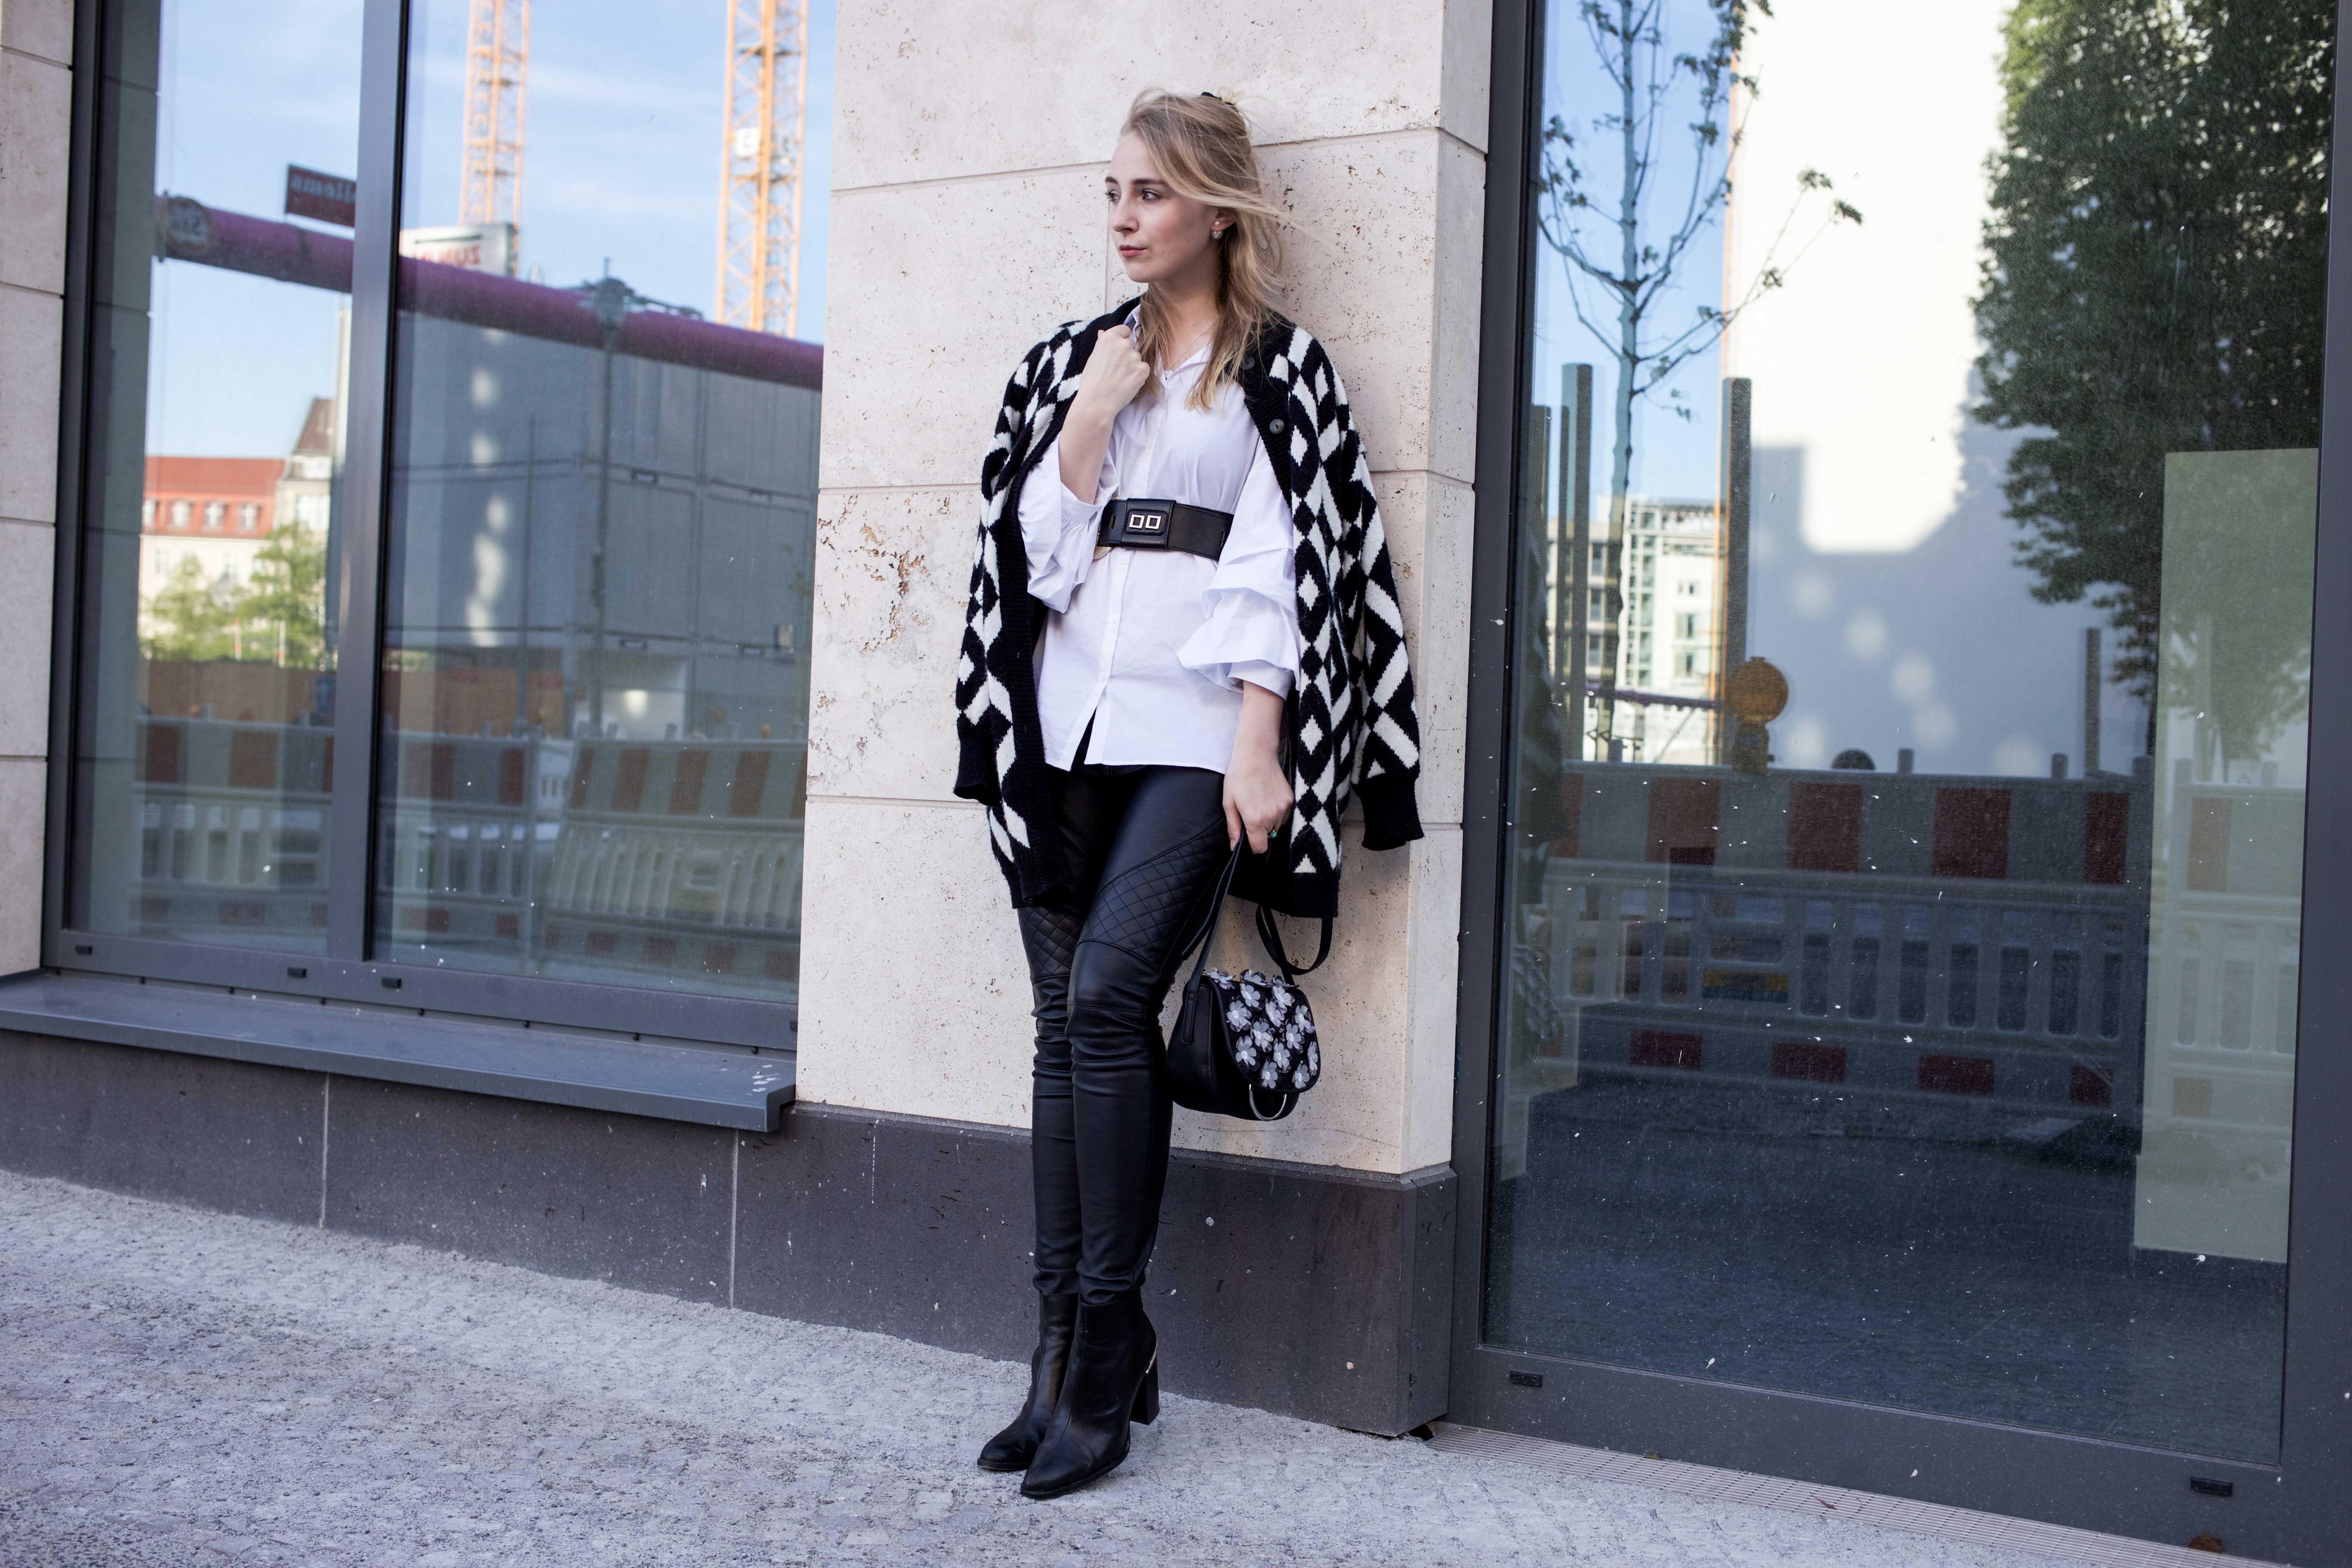 trendreport-weiße-bluse-trompetenärmel-fashionblog-ootd-modeblog-berlin_8791